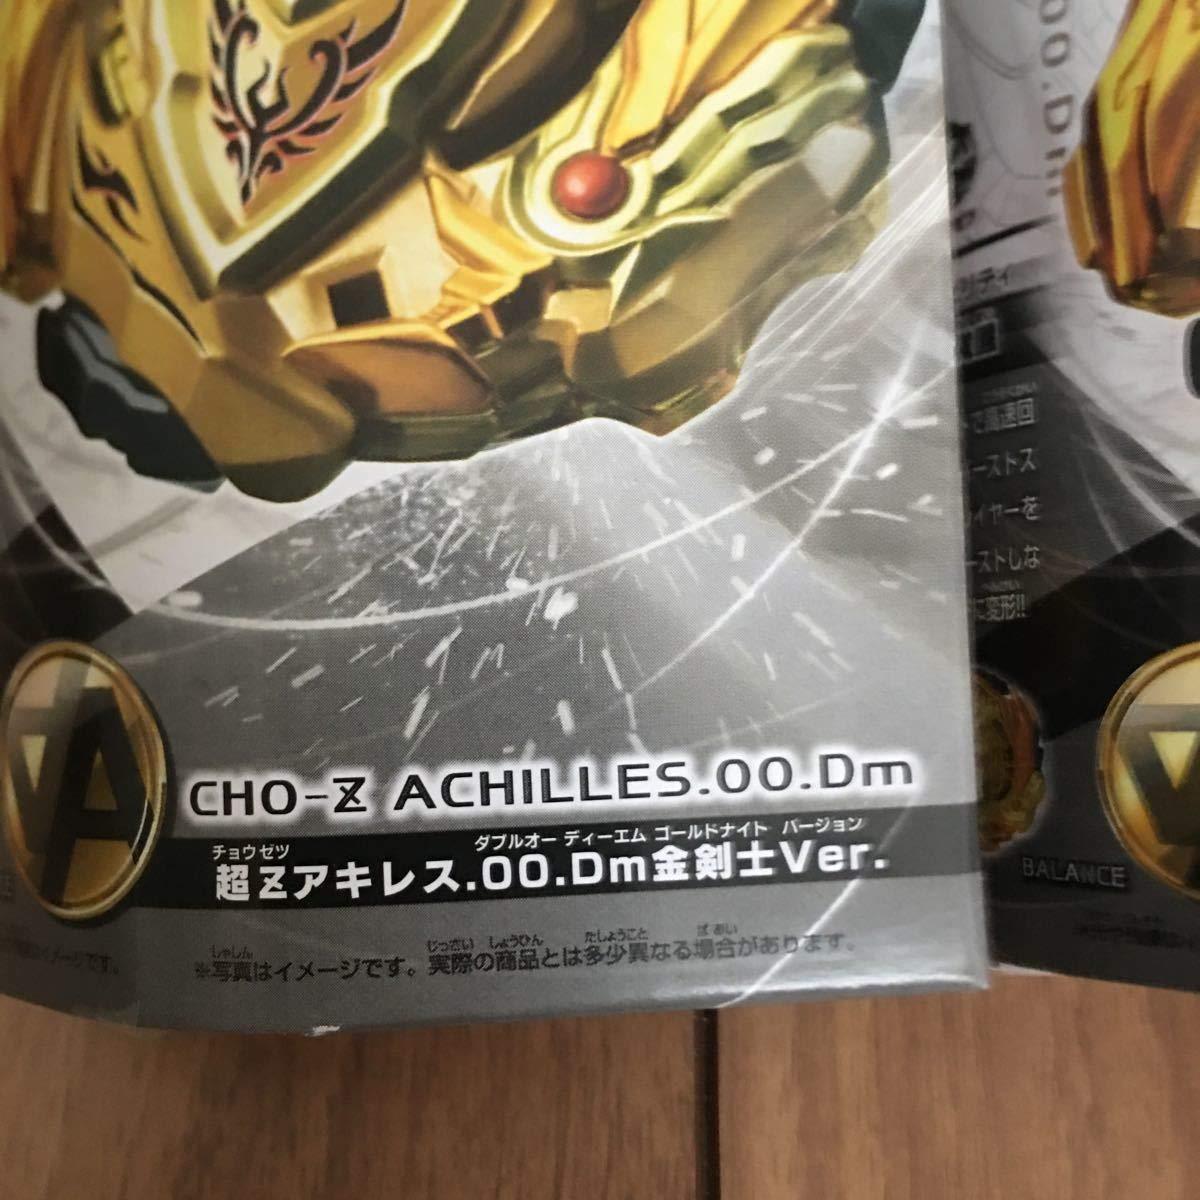 Tracking BEYBLADE BURST BBG-20 BOOSTER CHO-Z Achilles.00.Dm GOLD Knight